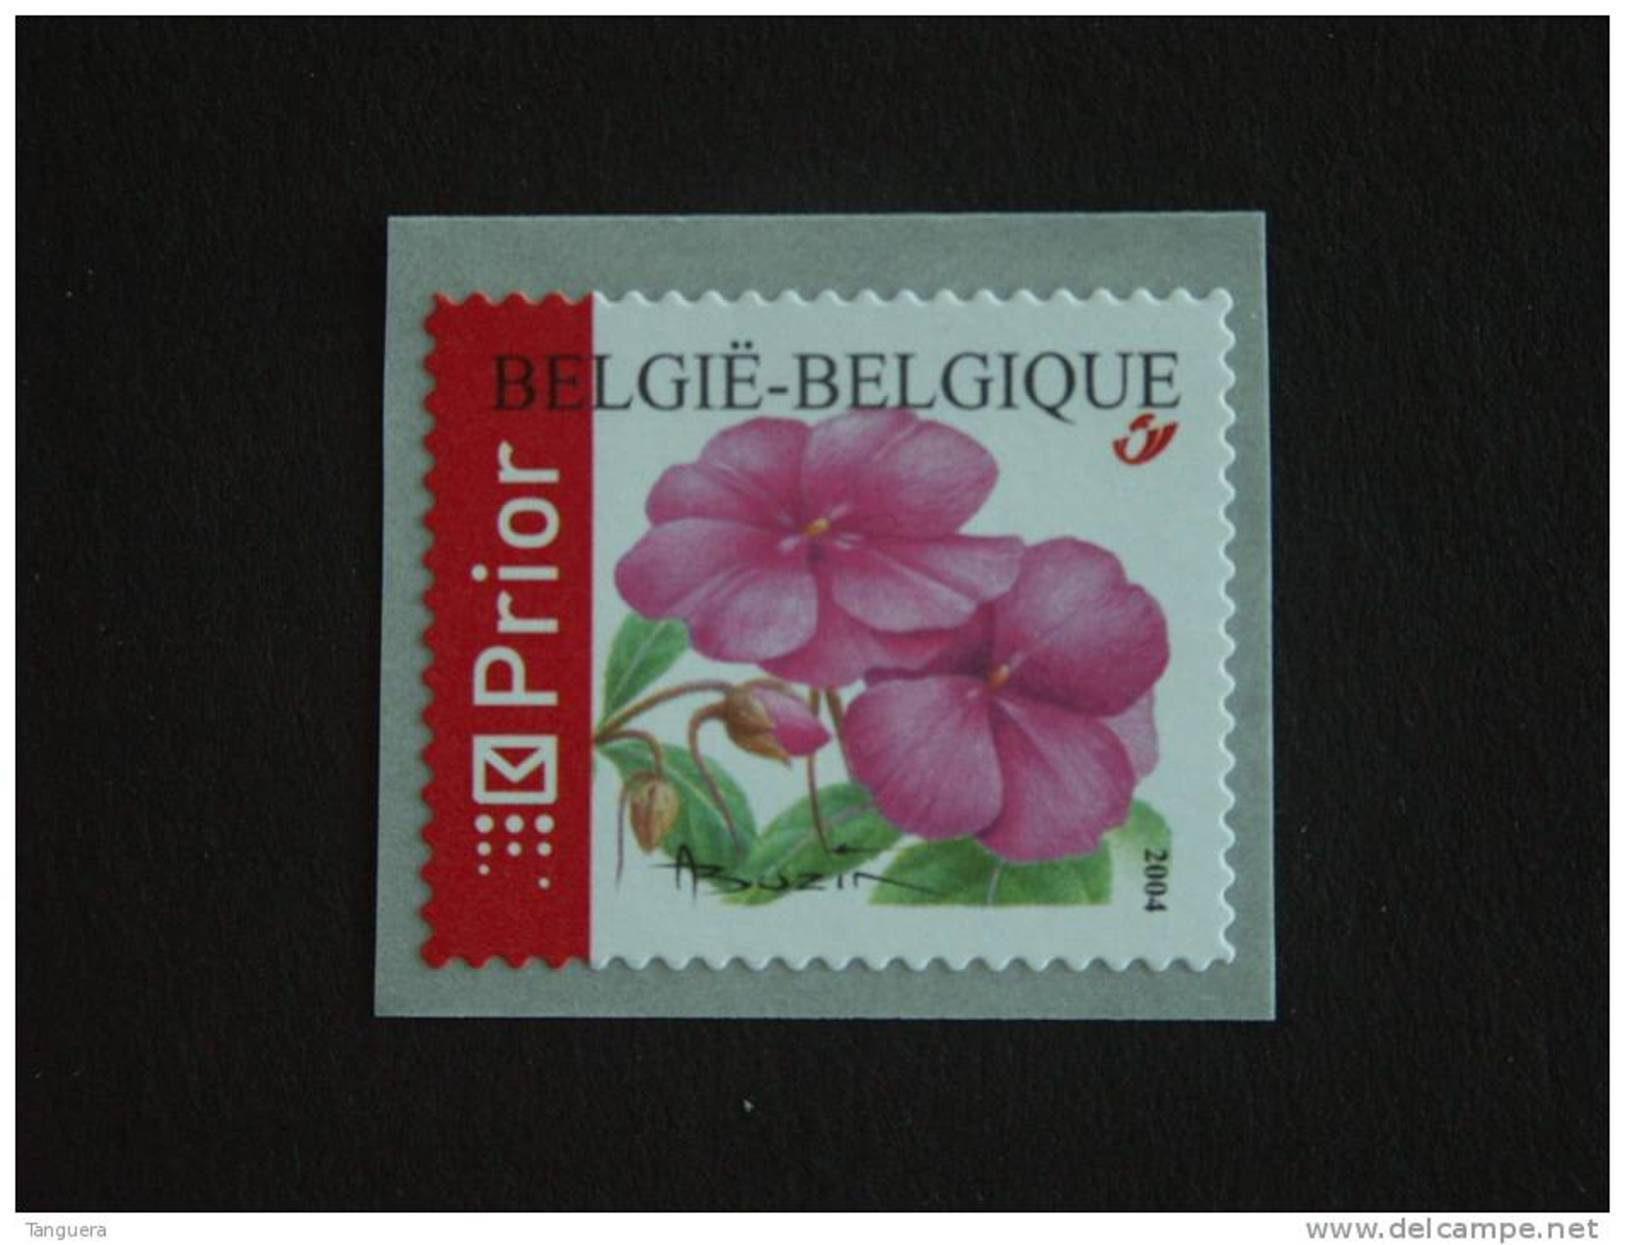 België Belgique Belgium 2004 Fleur Bloemen Impatiens Rolzegel Rouleau R109 3347 MNH ** - Rollen